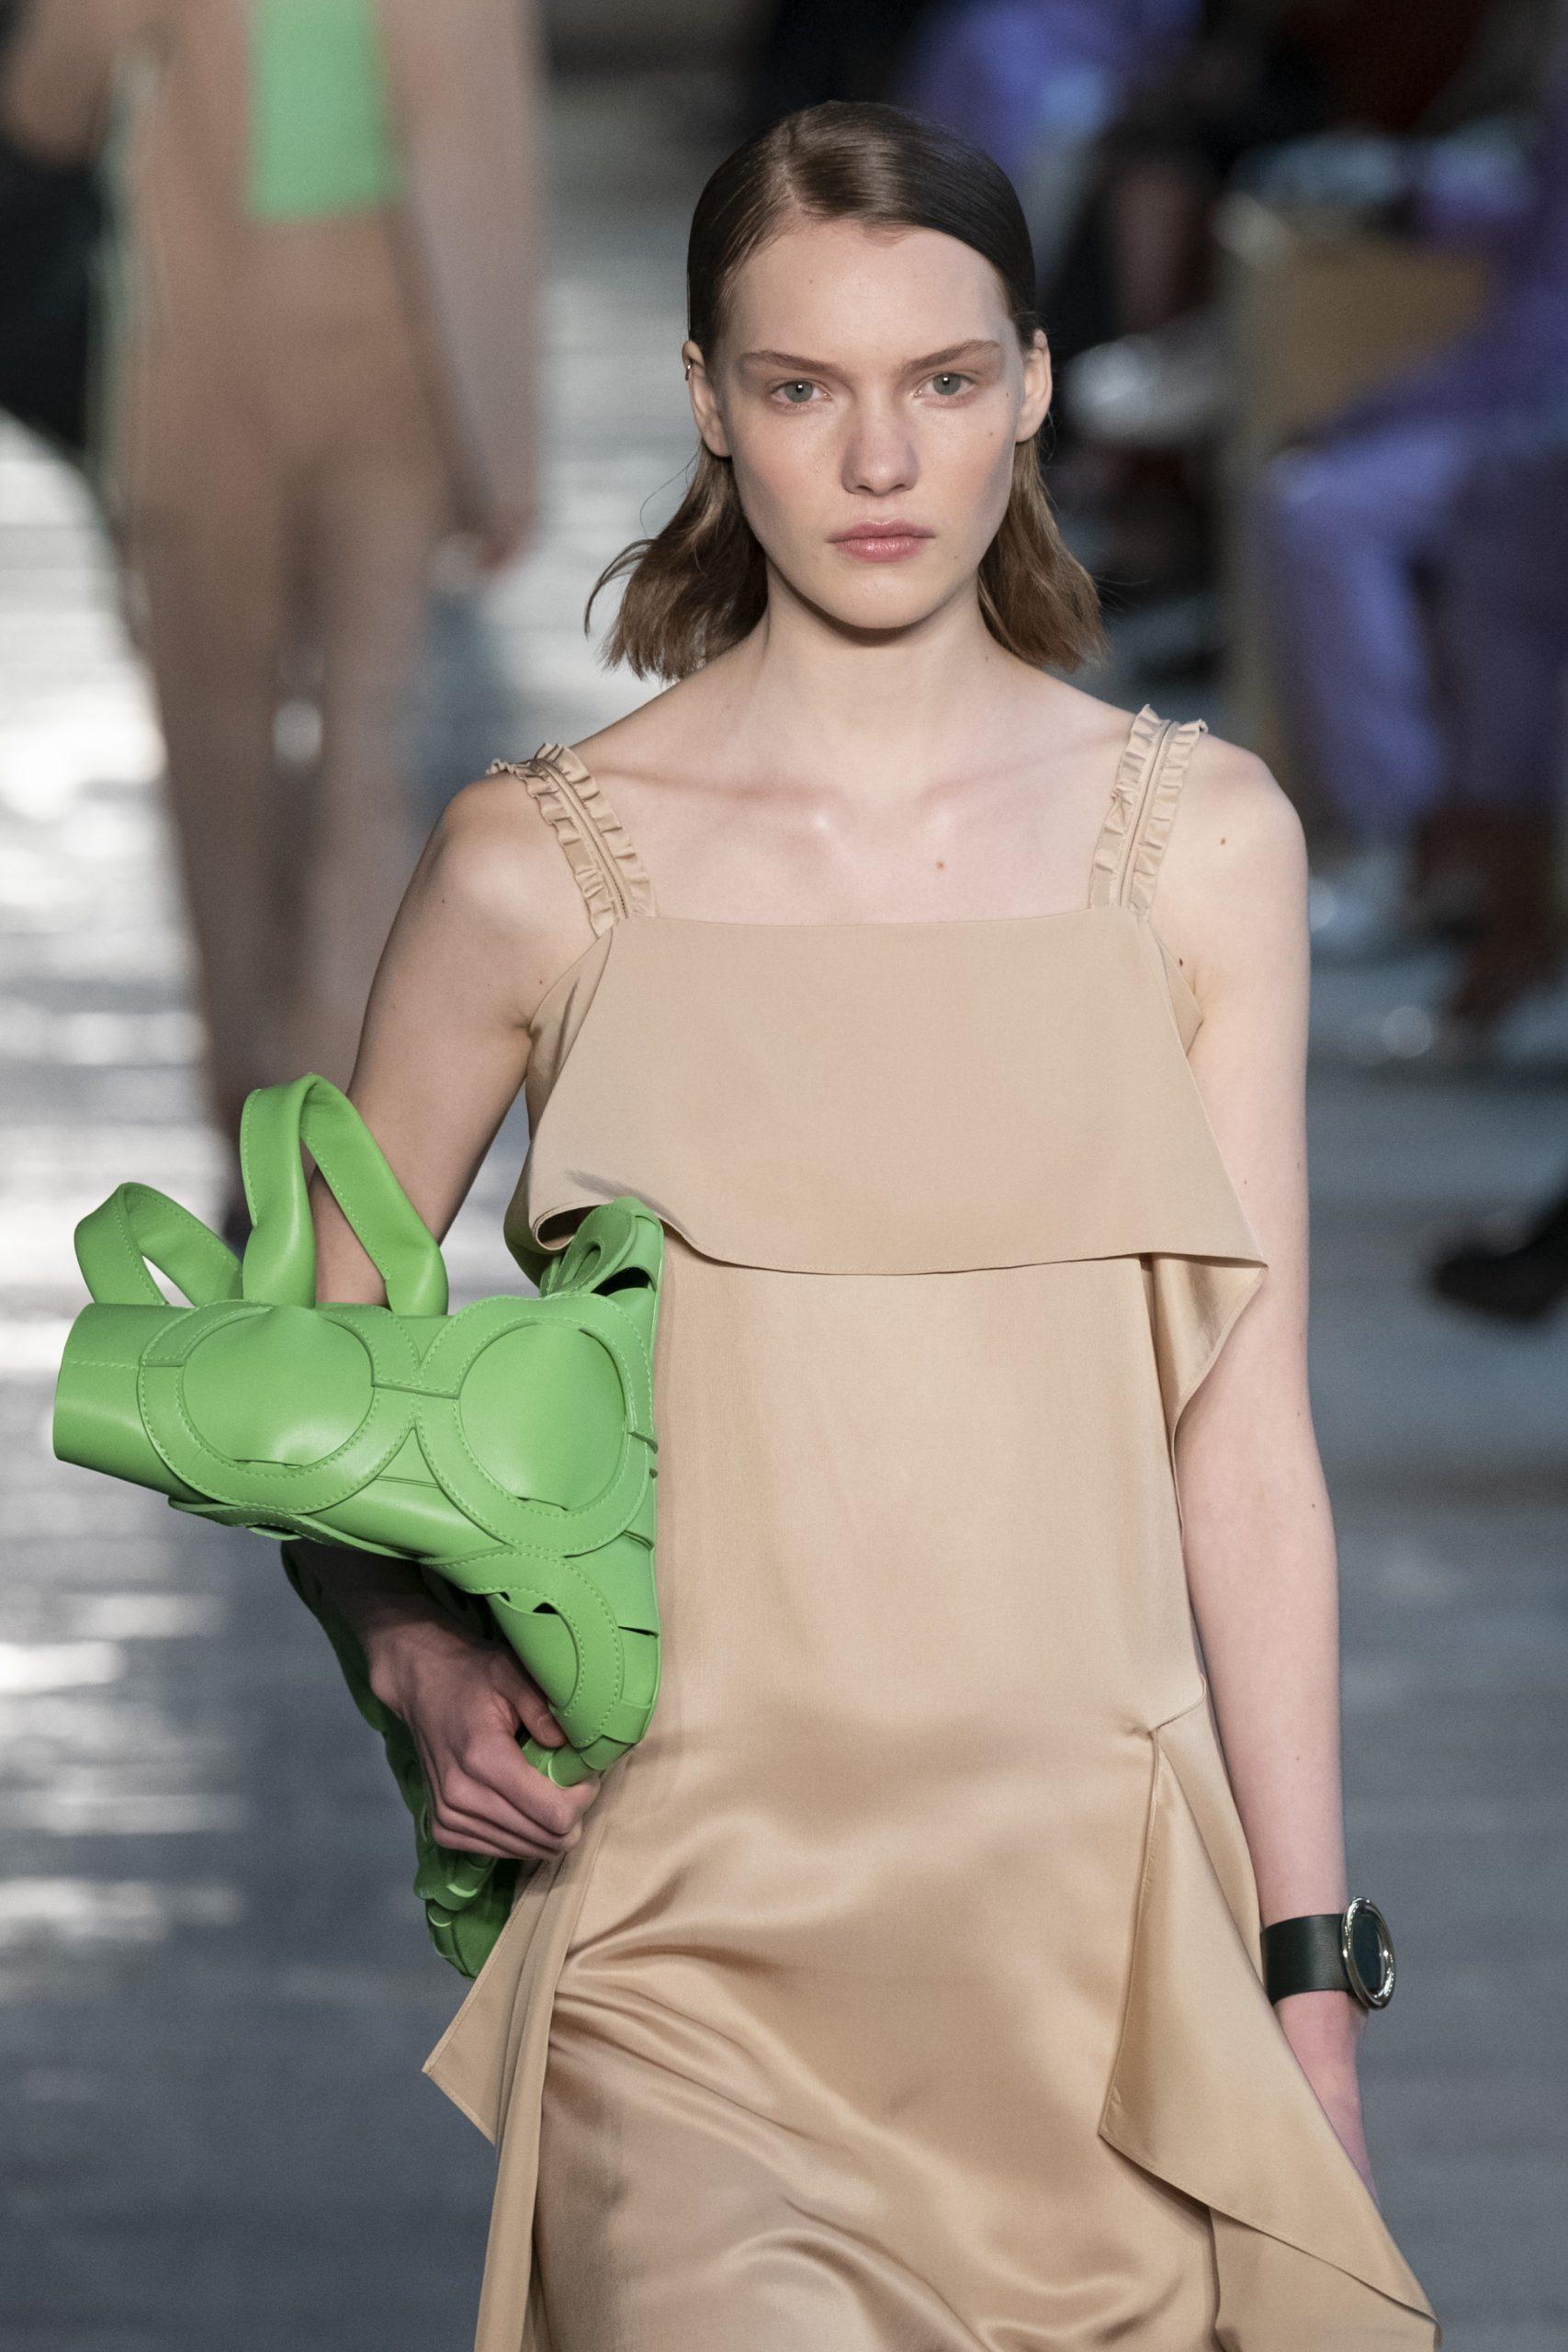 Accessories report: Κάνε update στο στυλ σου με τα πιο fashionable αξεσουάρ